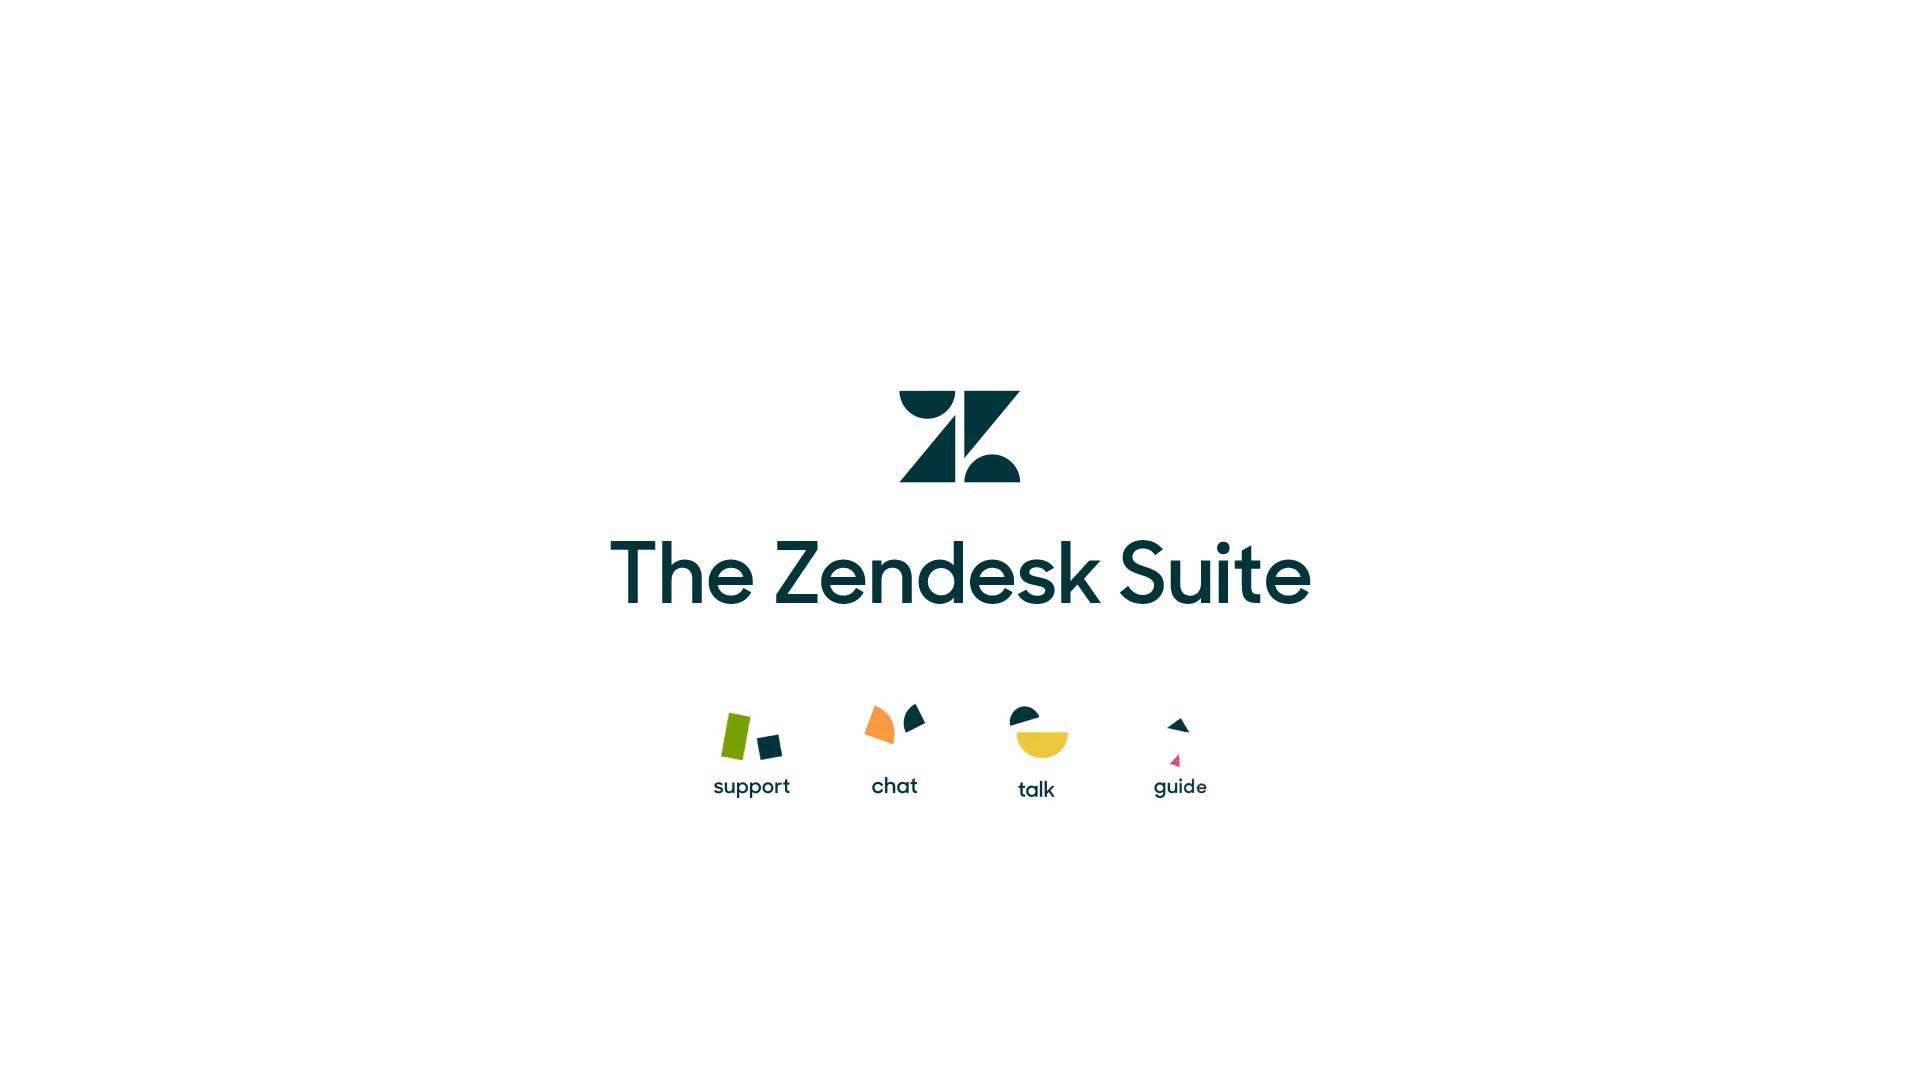 zendesk customer service software support ticket system